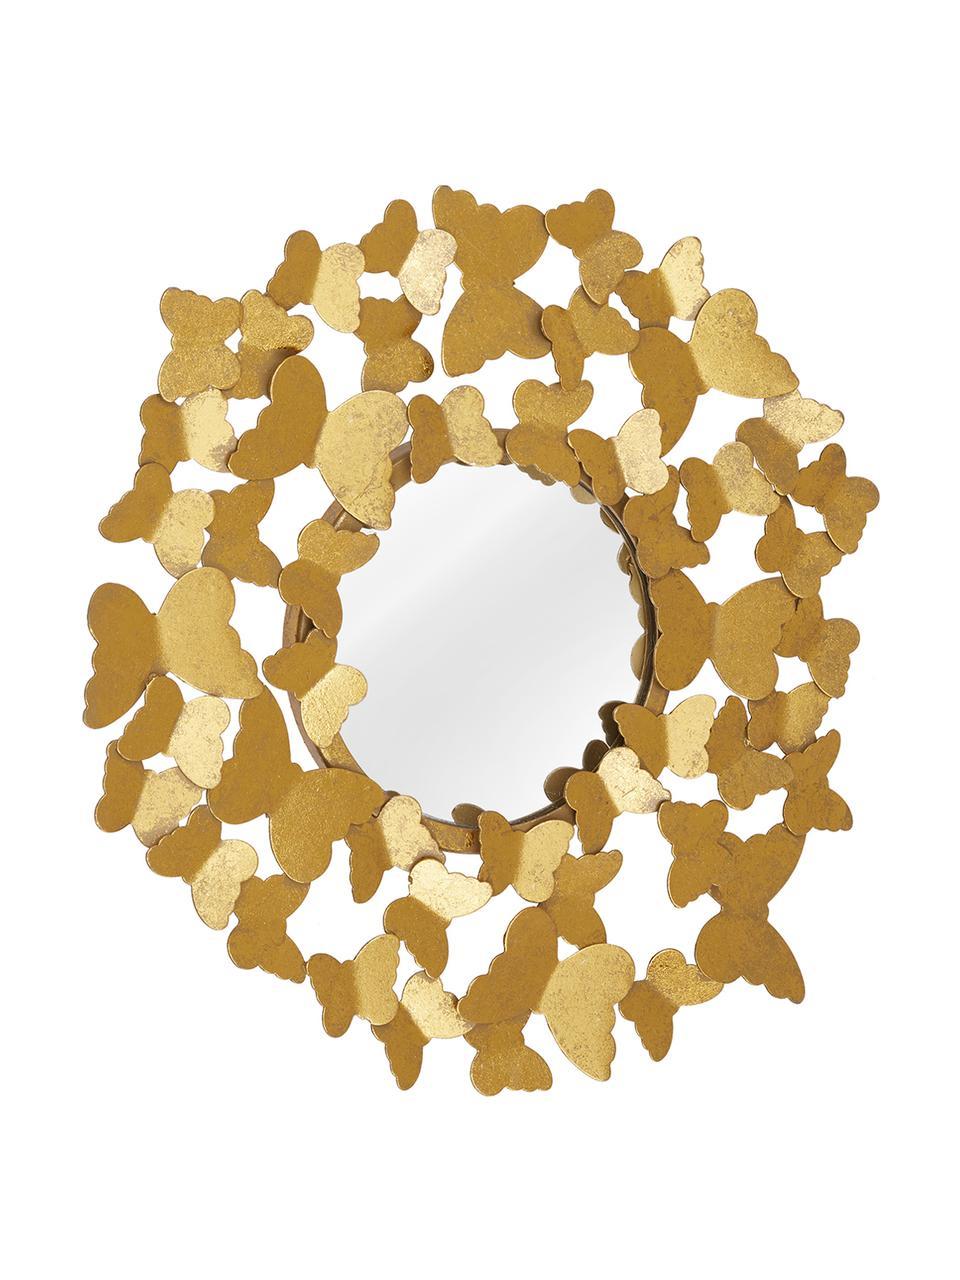 Miroir mural rond Butterfly, Couleur dorée